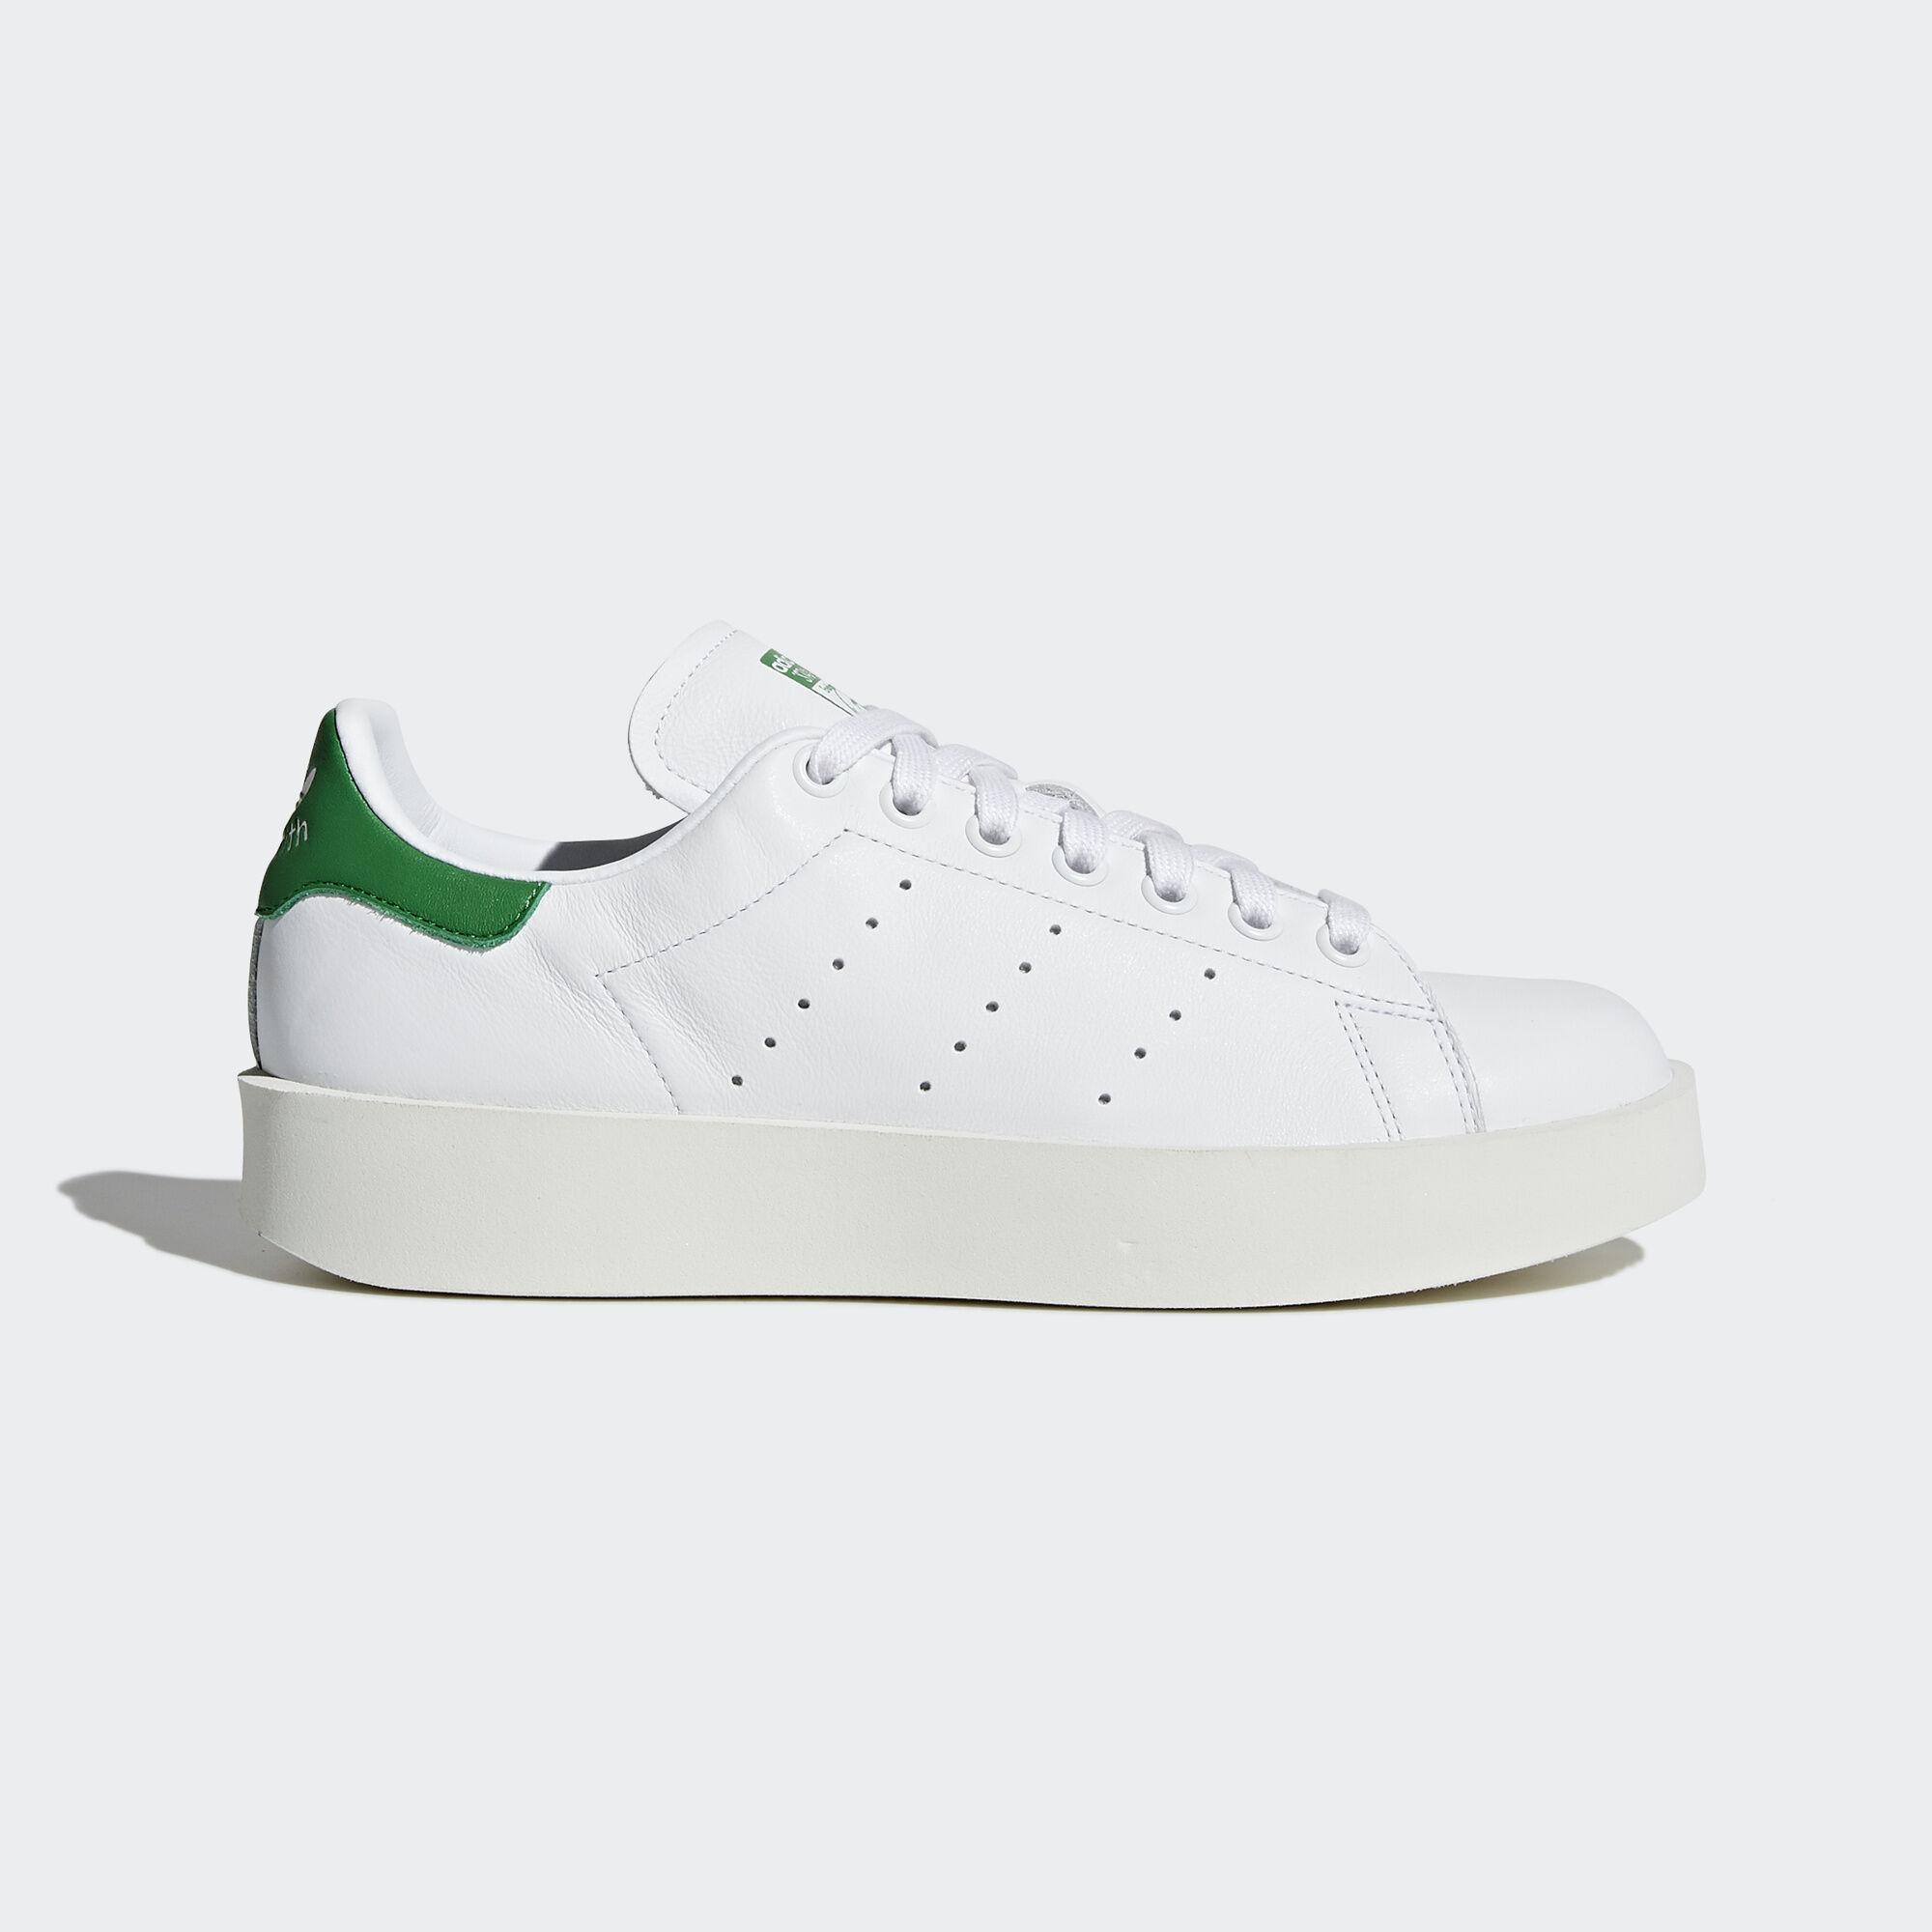 88199a28f1 adidas stan smith vintage zebrate